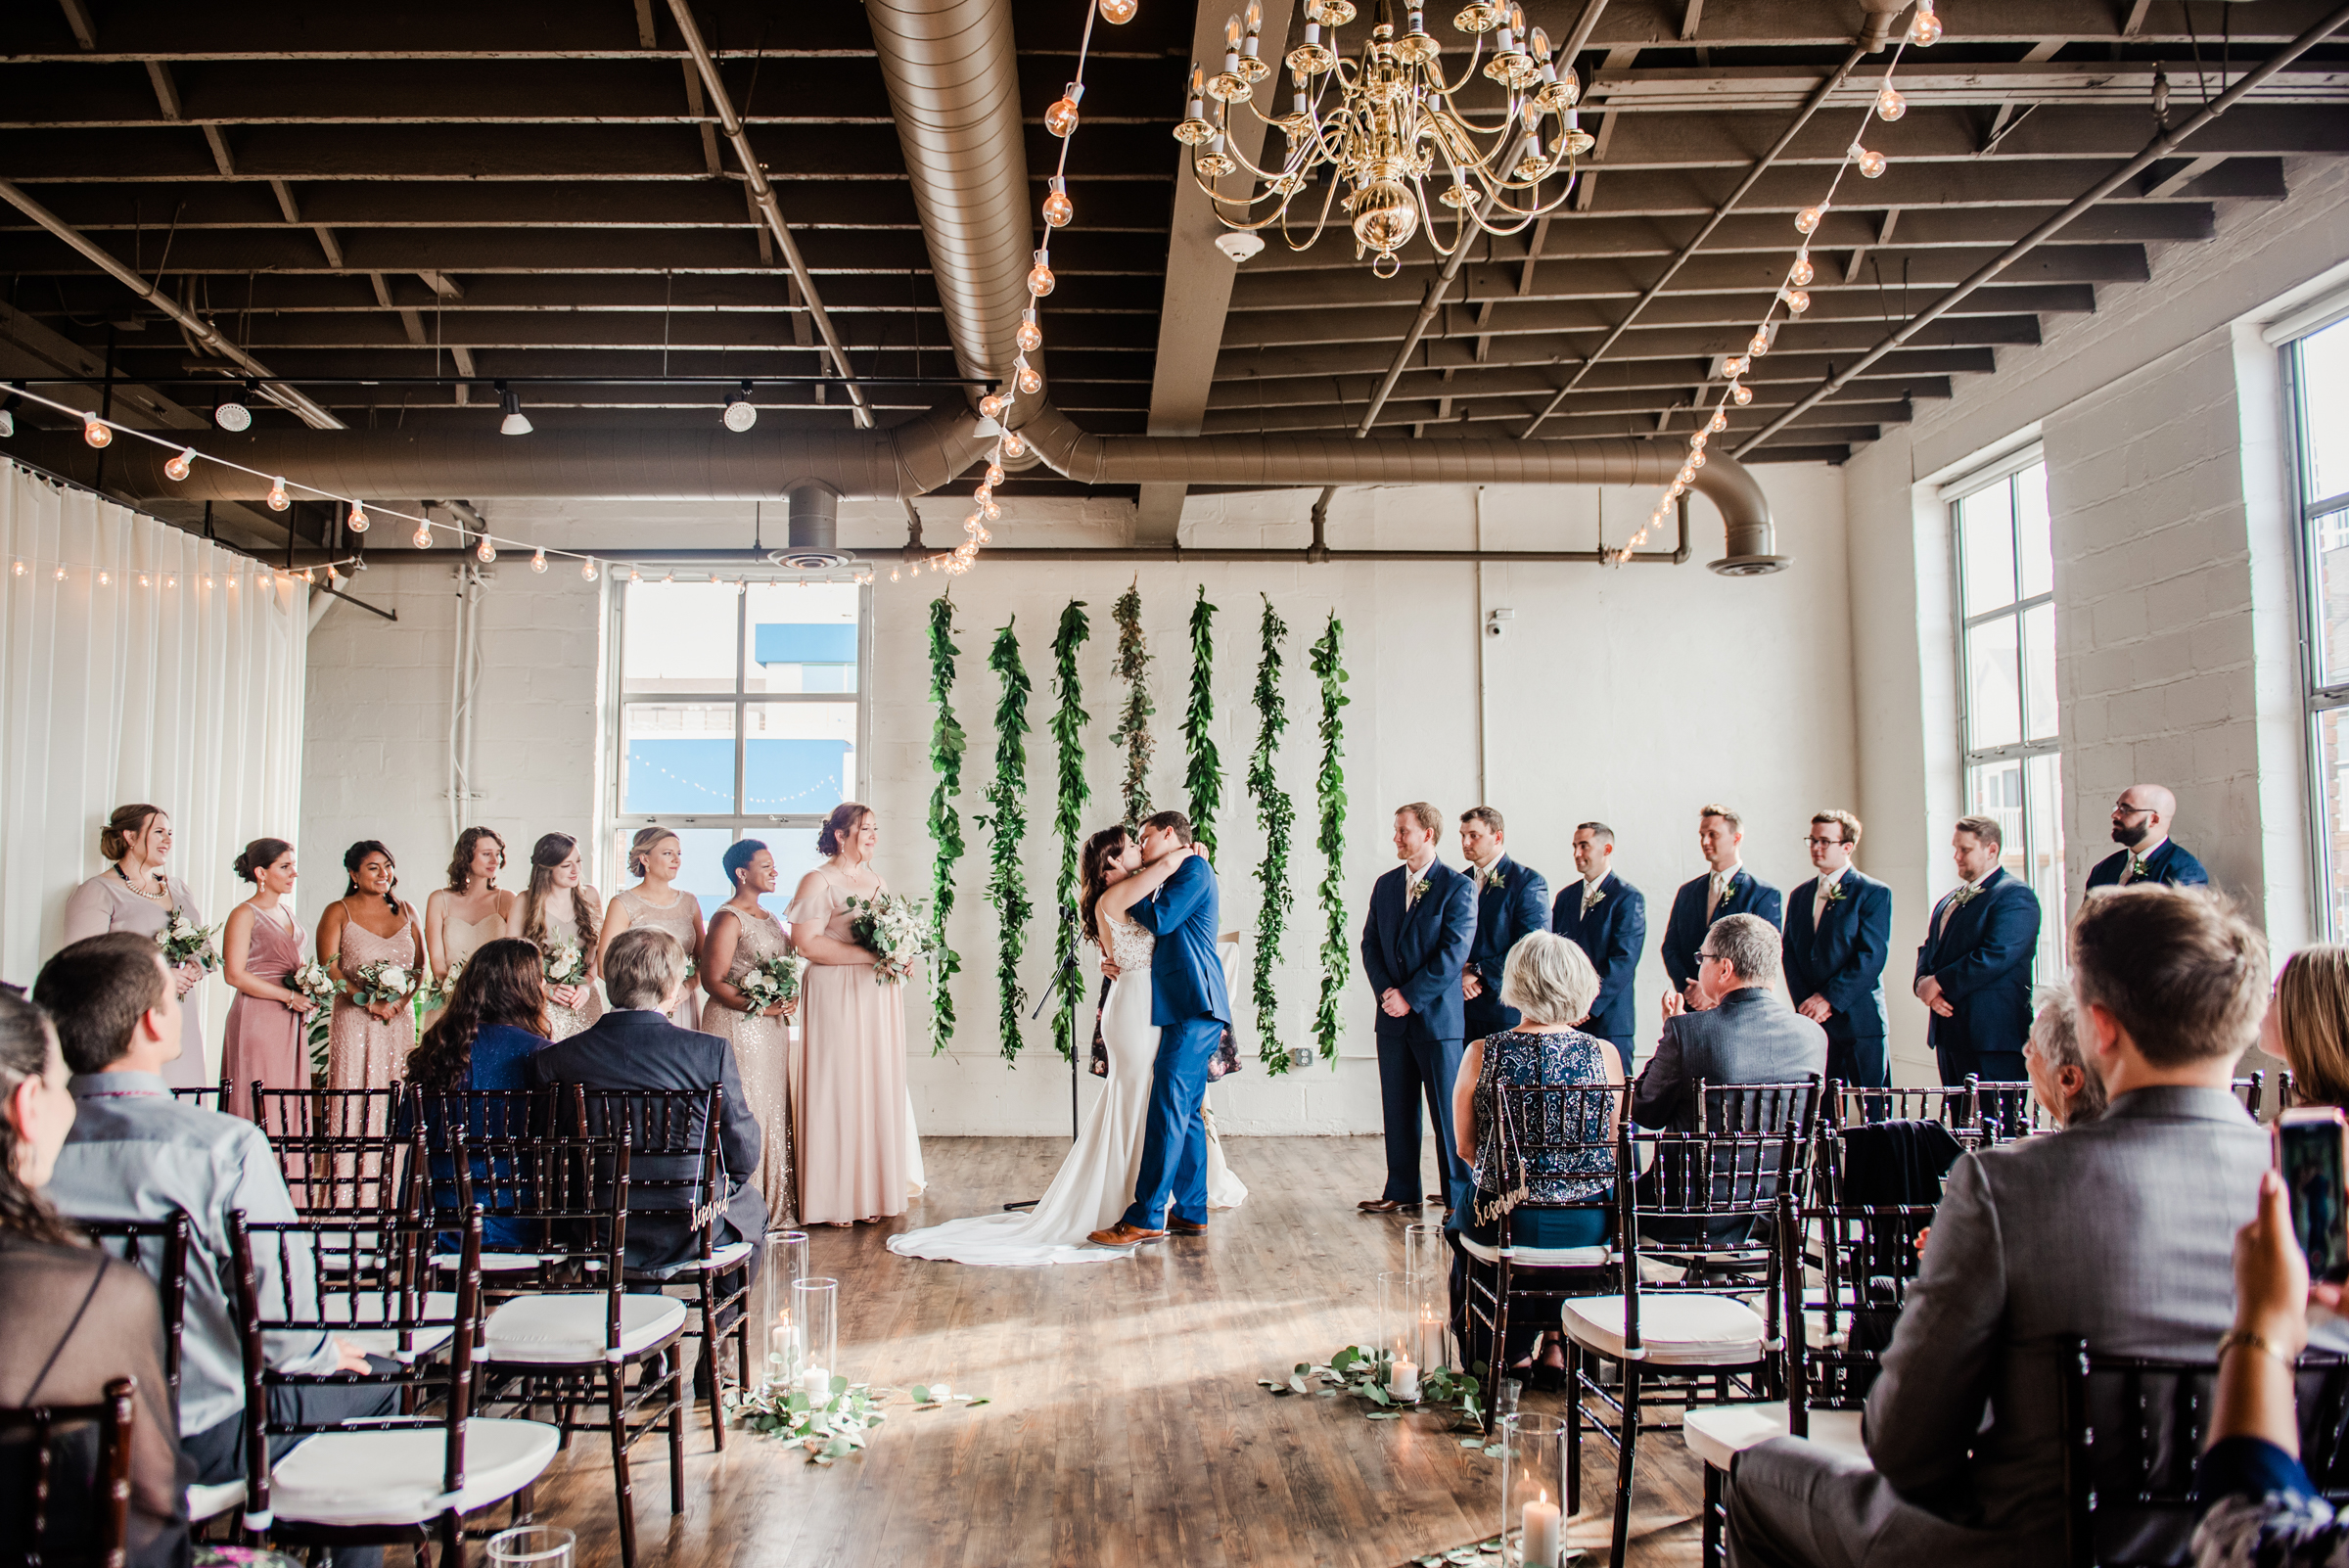 The_Arbor_LoftRochester_Wedding_JILL_STUDIO_Rochester_NY_Photographer_171654.jpg